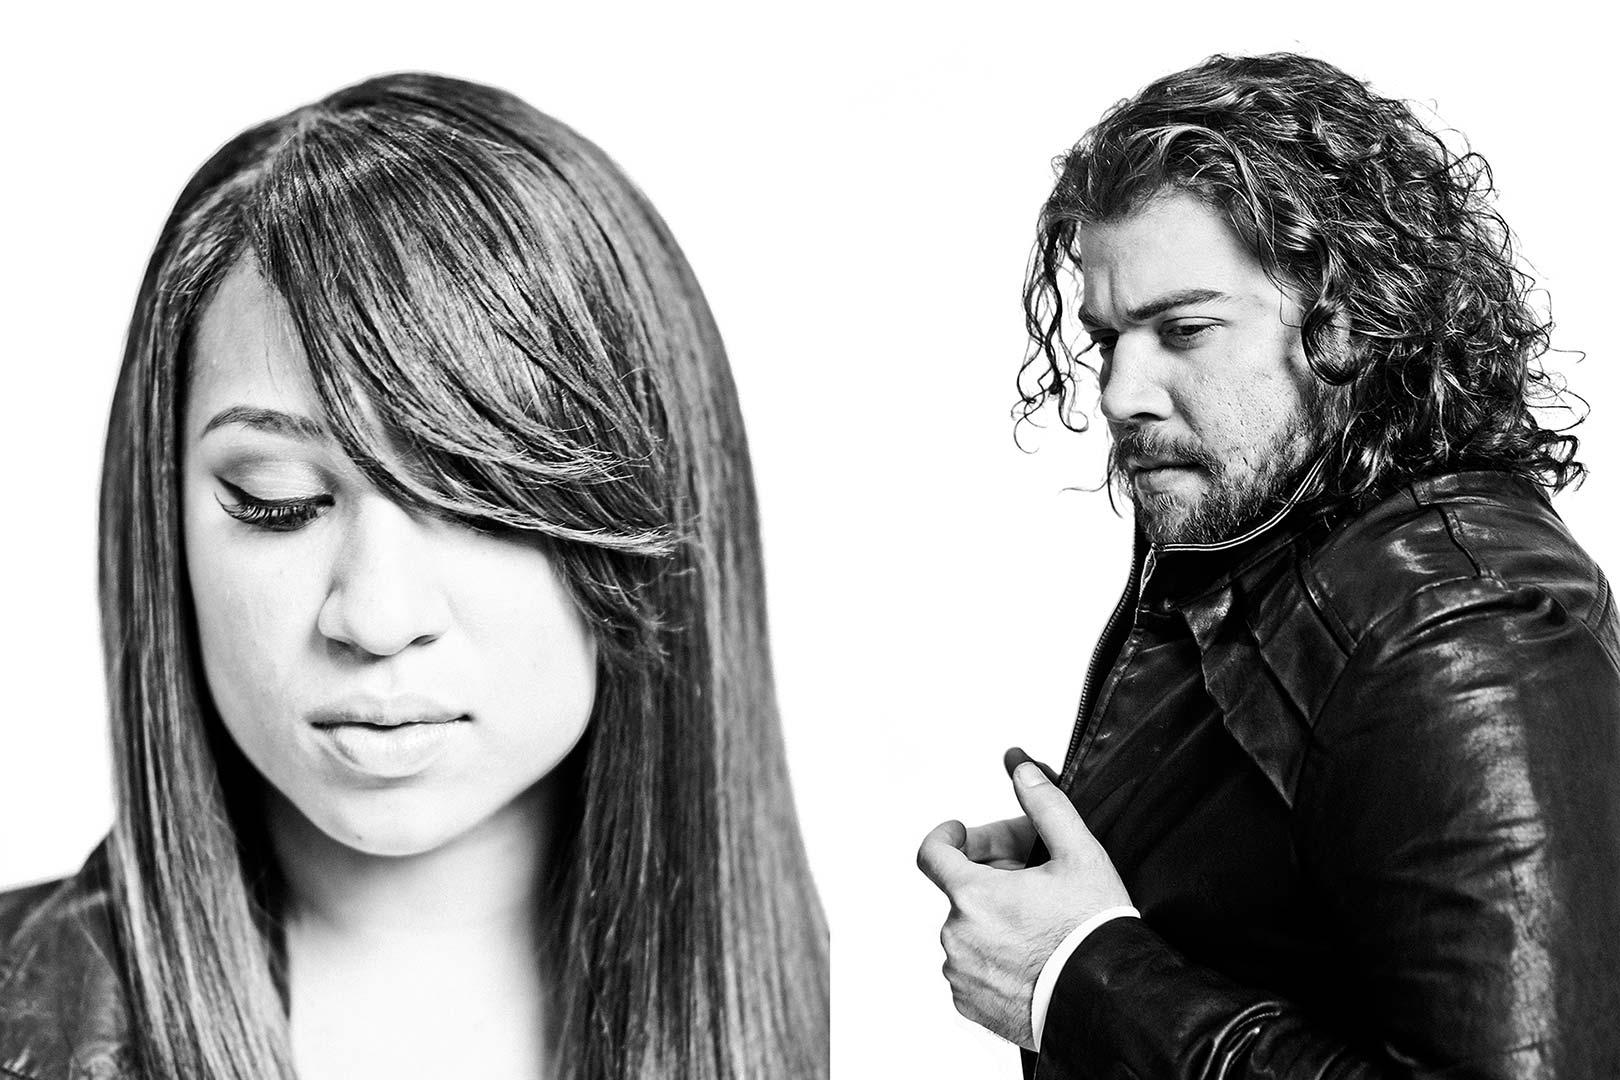 Portraits of X Factor Finalists Melanie Amaro and Josh Krajcik